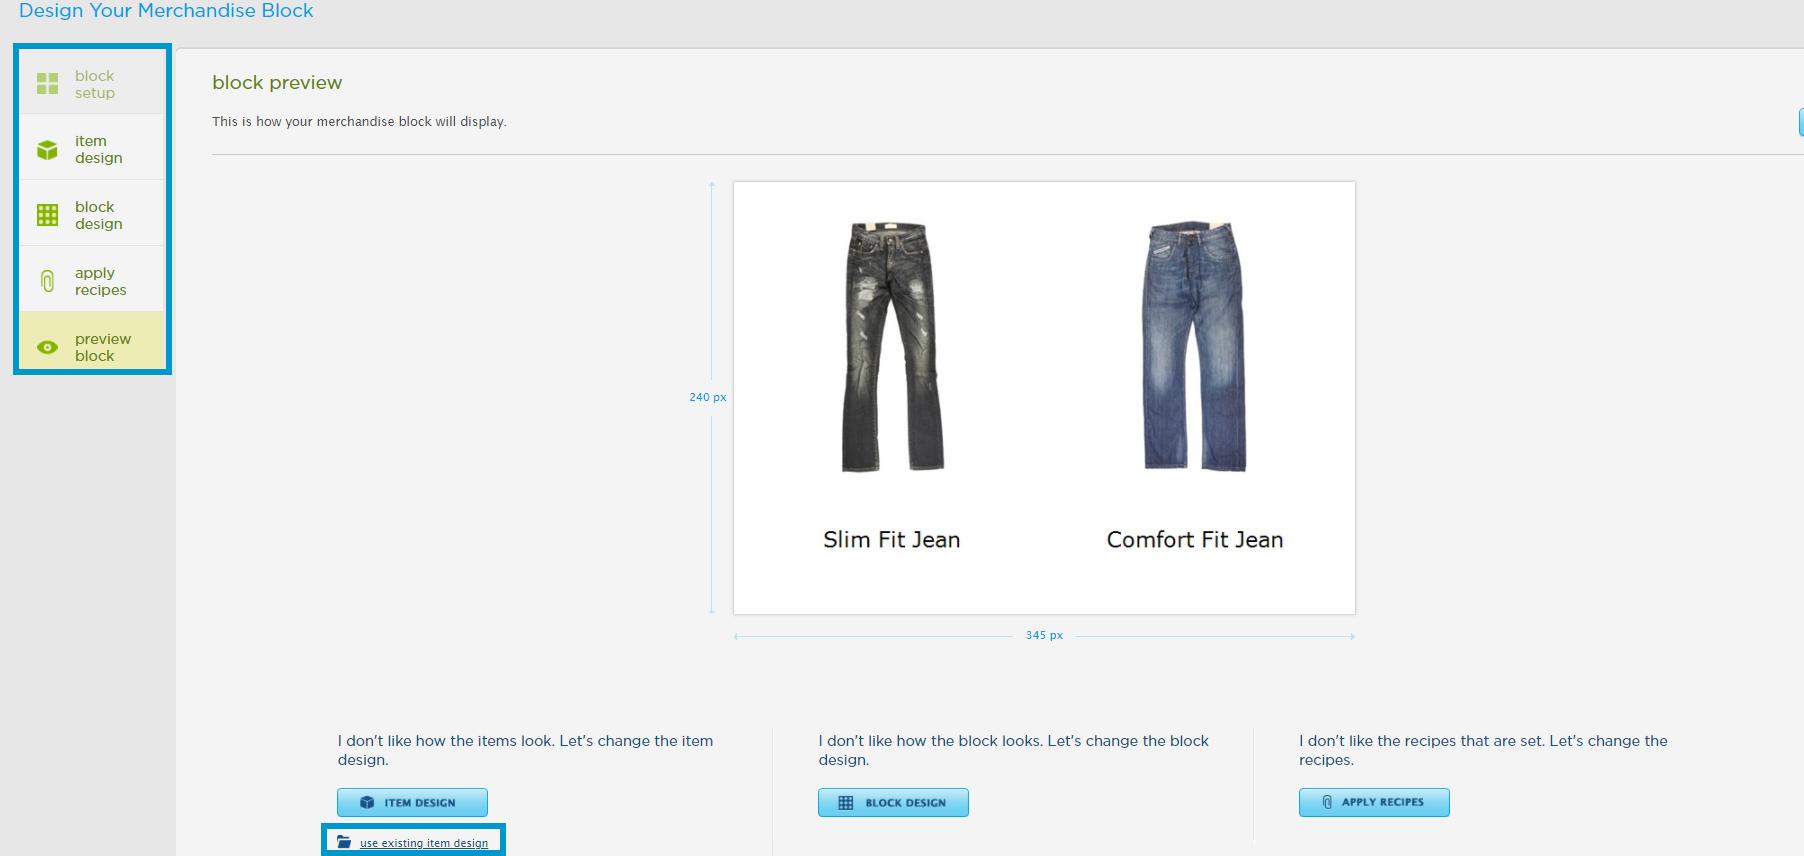 Design a Merchandise Block